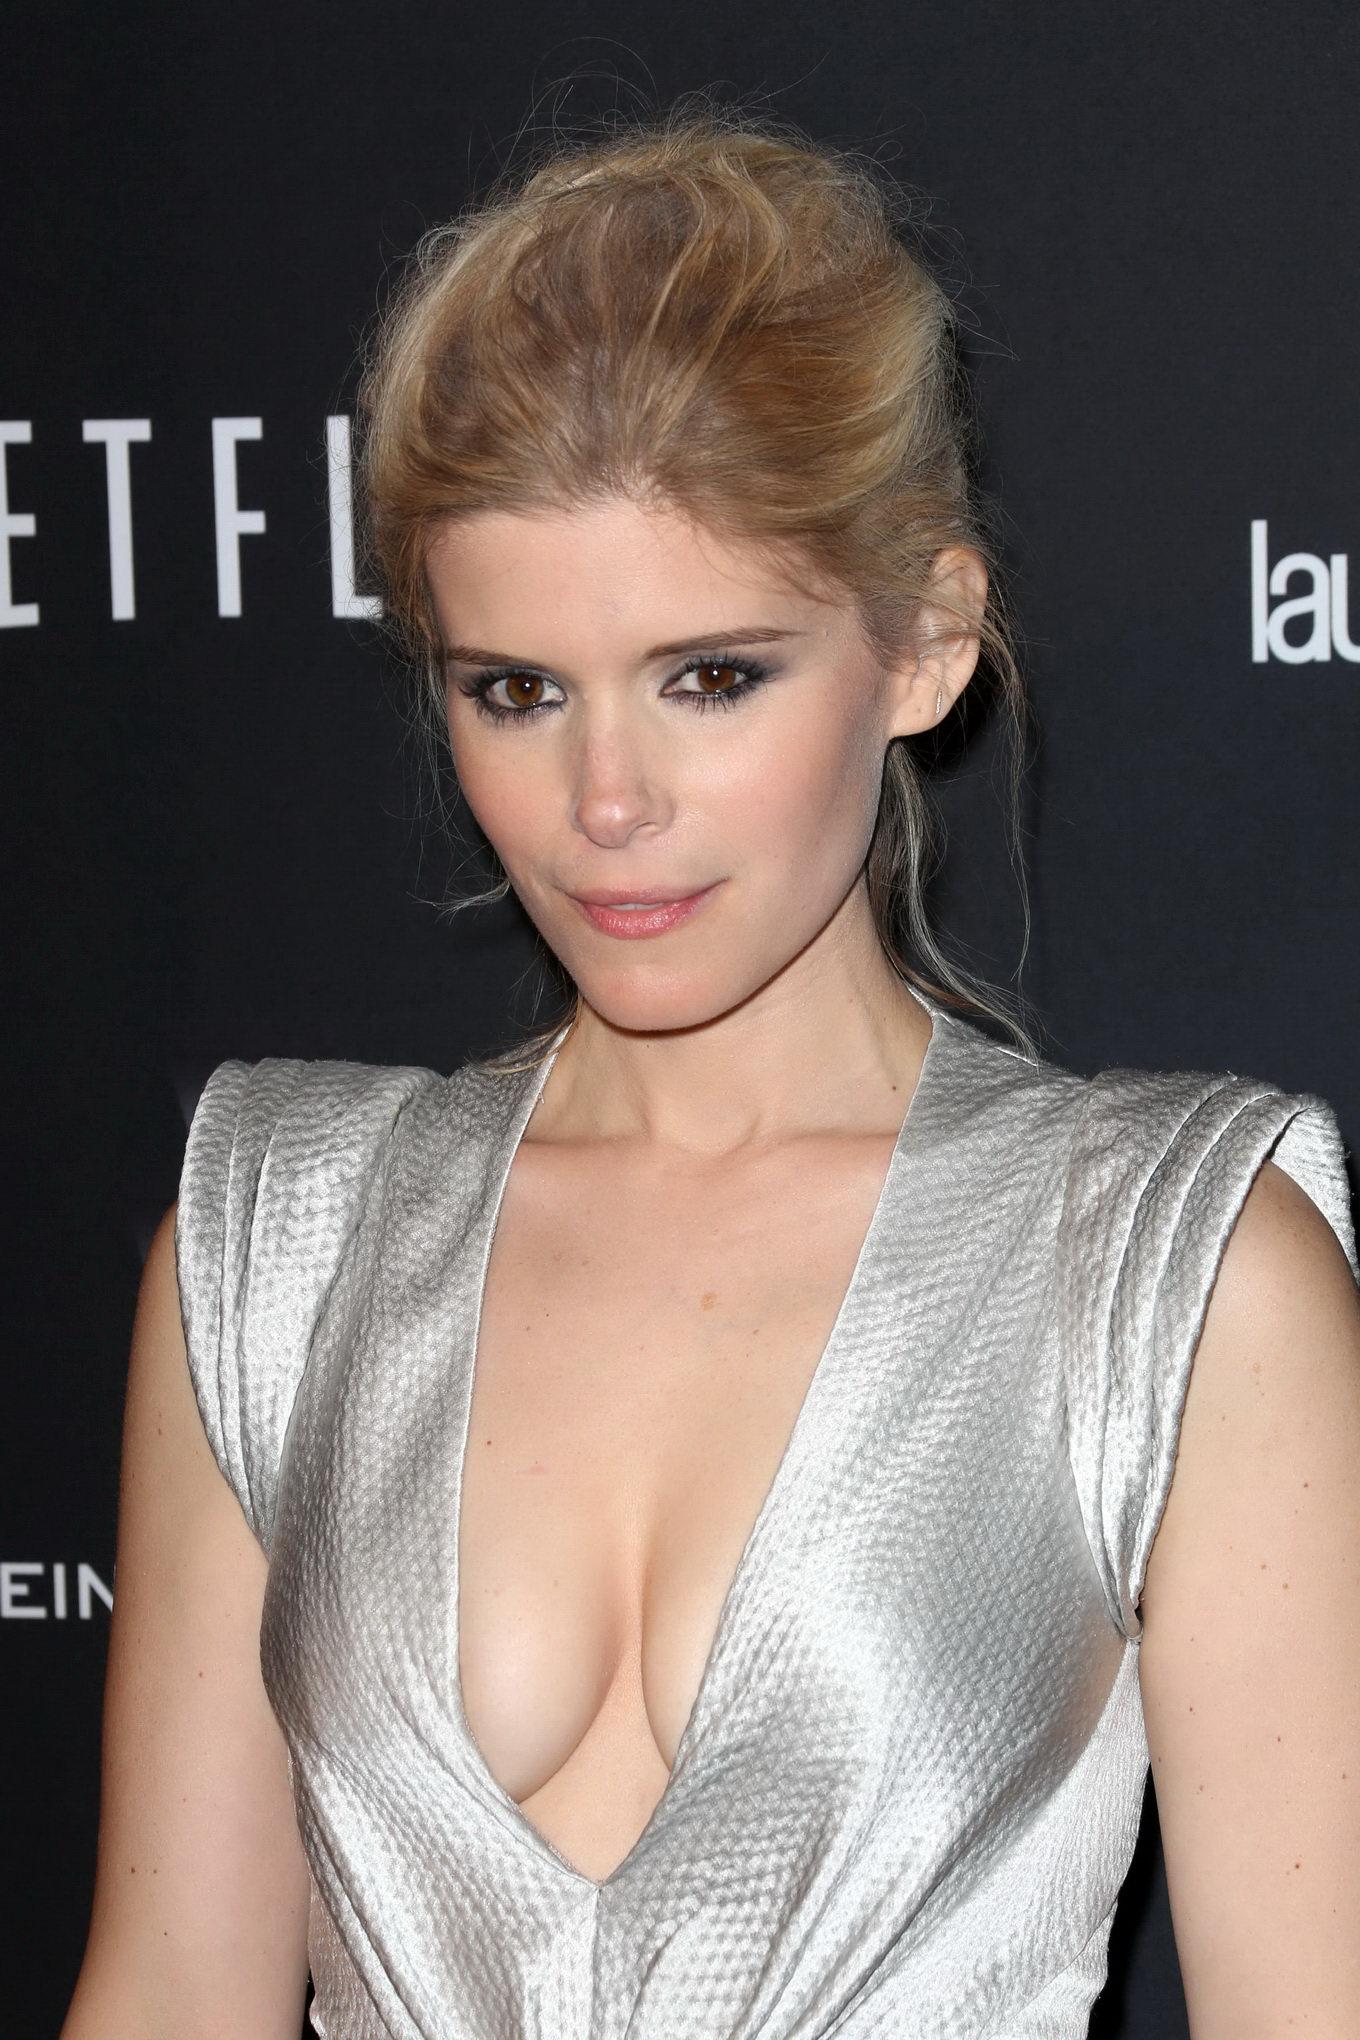 Kate-Mara-cleavage-in-Fantastic-Four